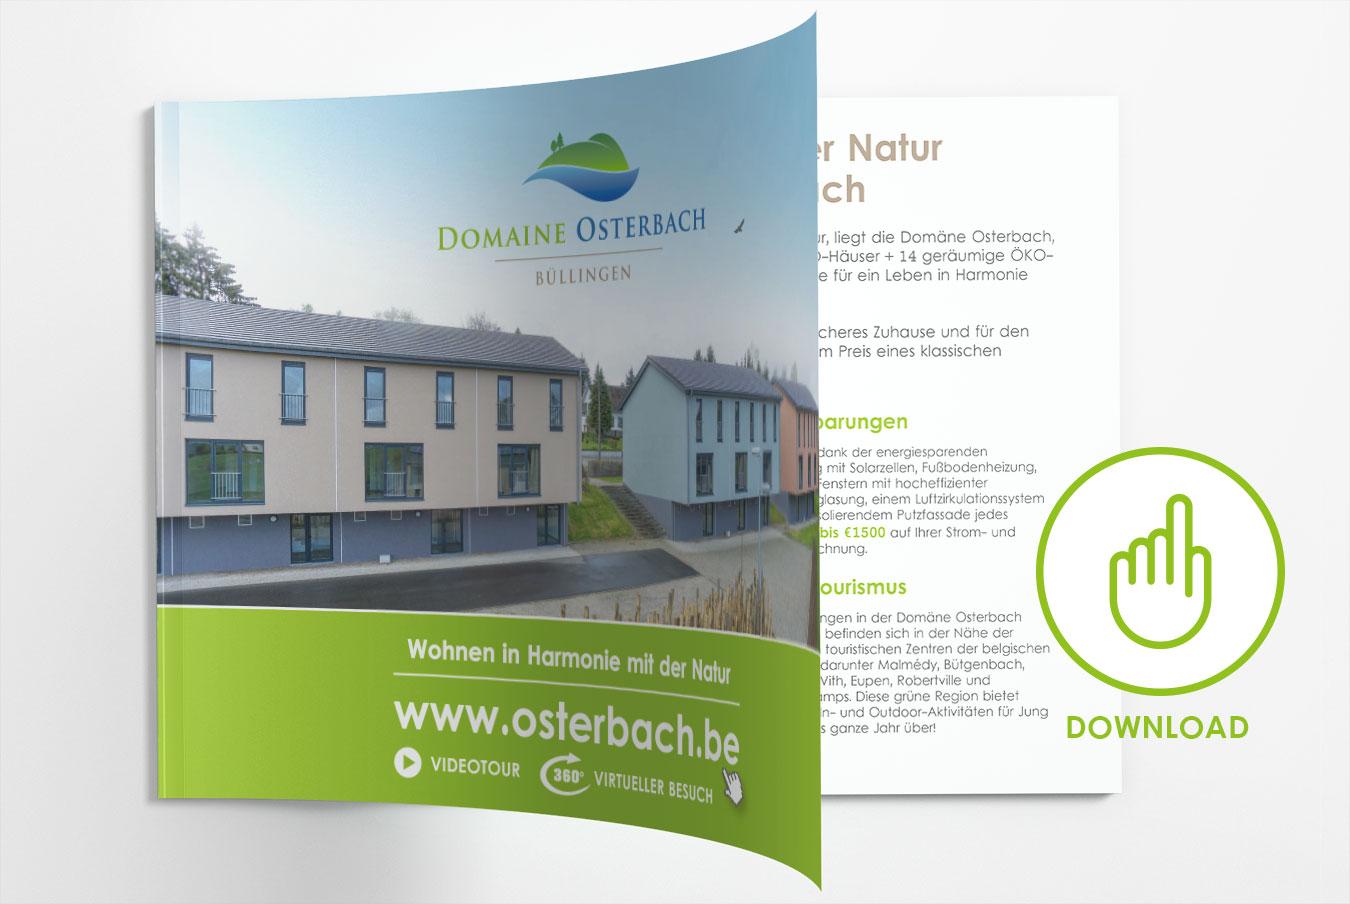 Domaine Osterbach Broschüre